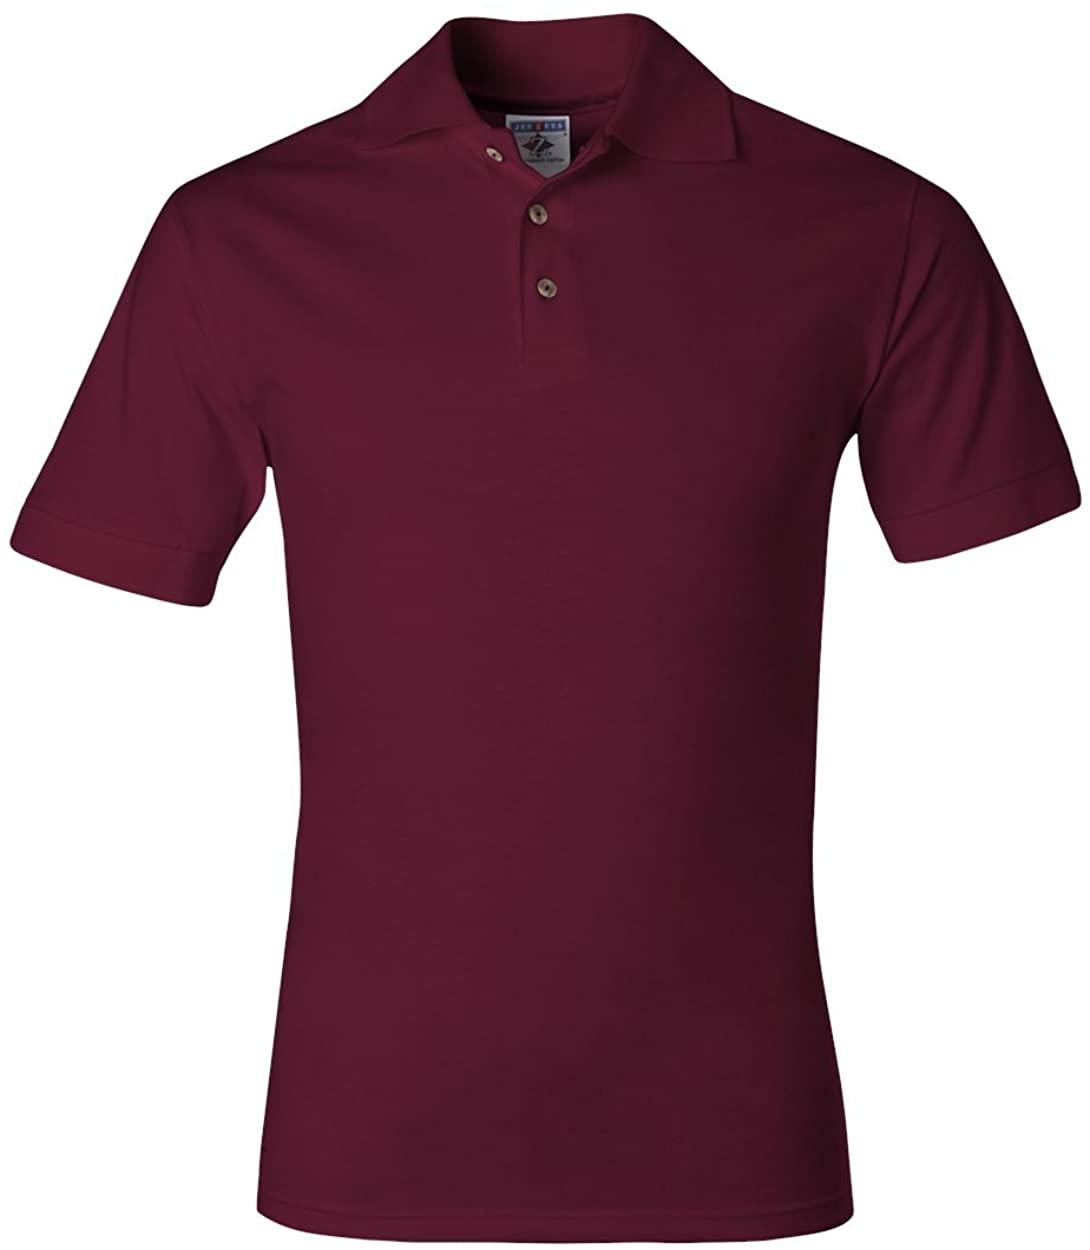 Jerzees 6.1 oz. Heavyweight Cotton Jersey Polo, Medium, MAROON